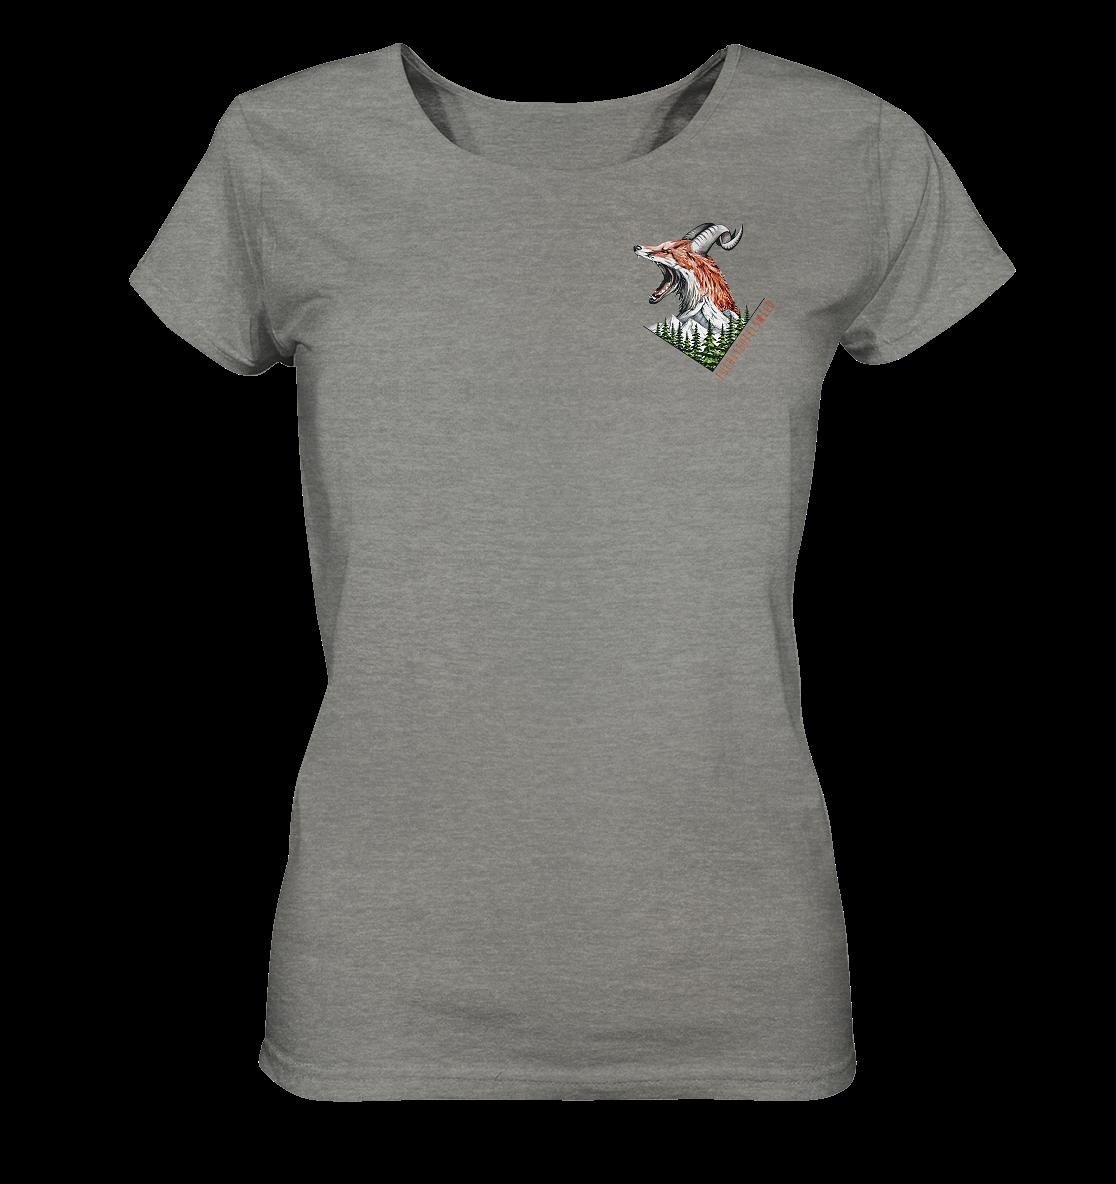 front-ladies-organic-shirt-meliert-818381-1116x-2.png